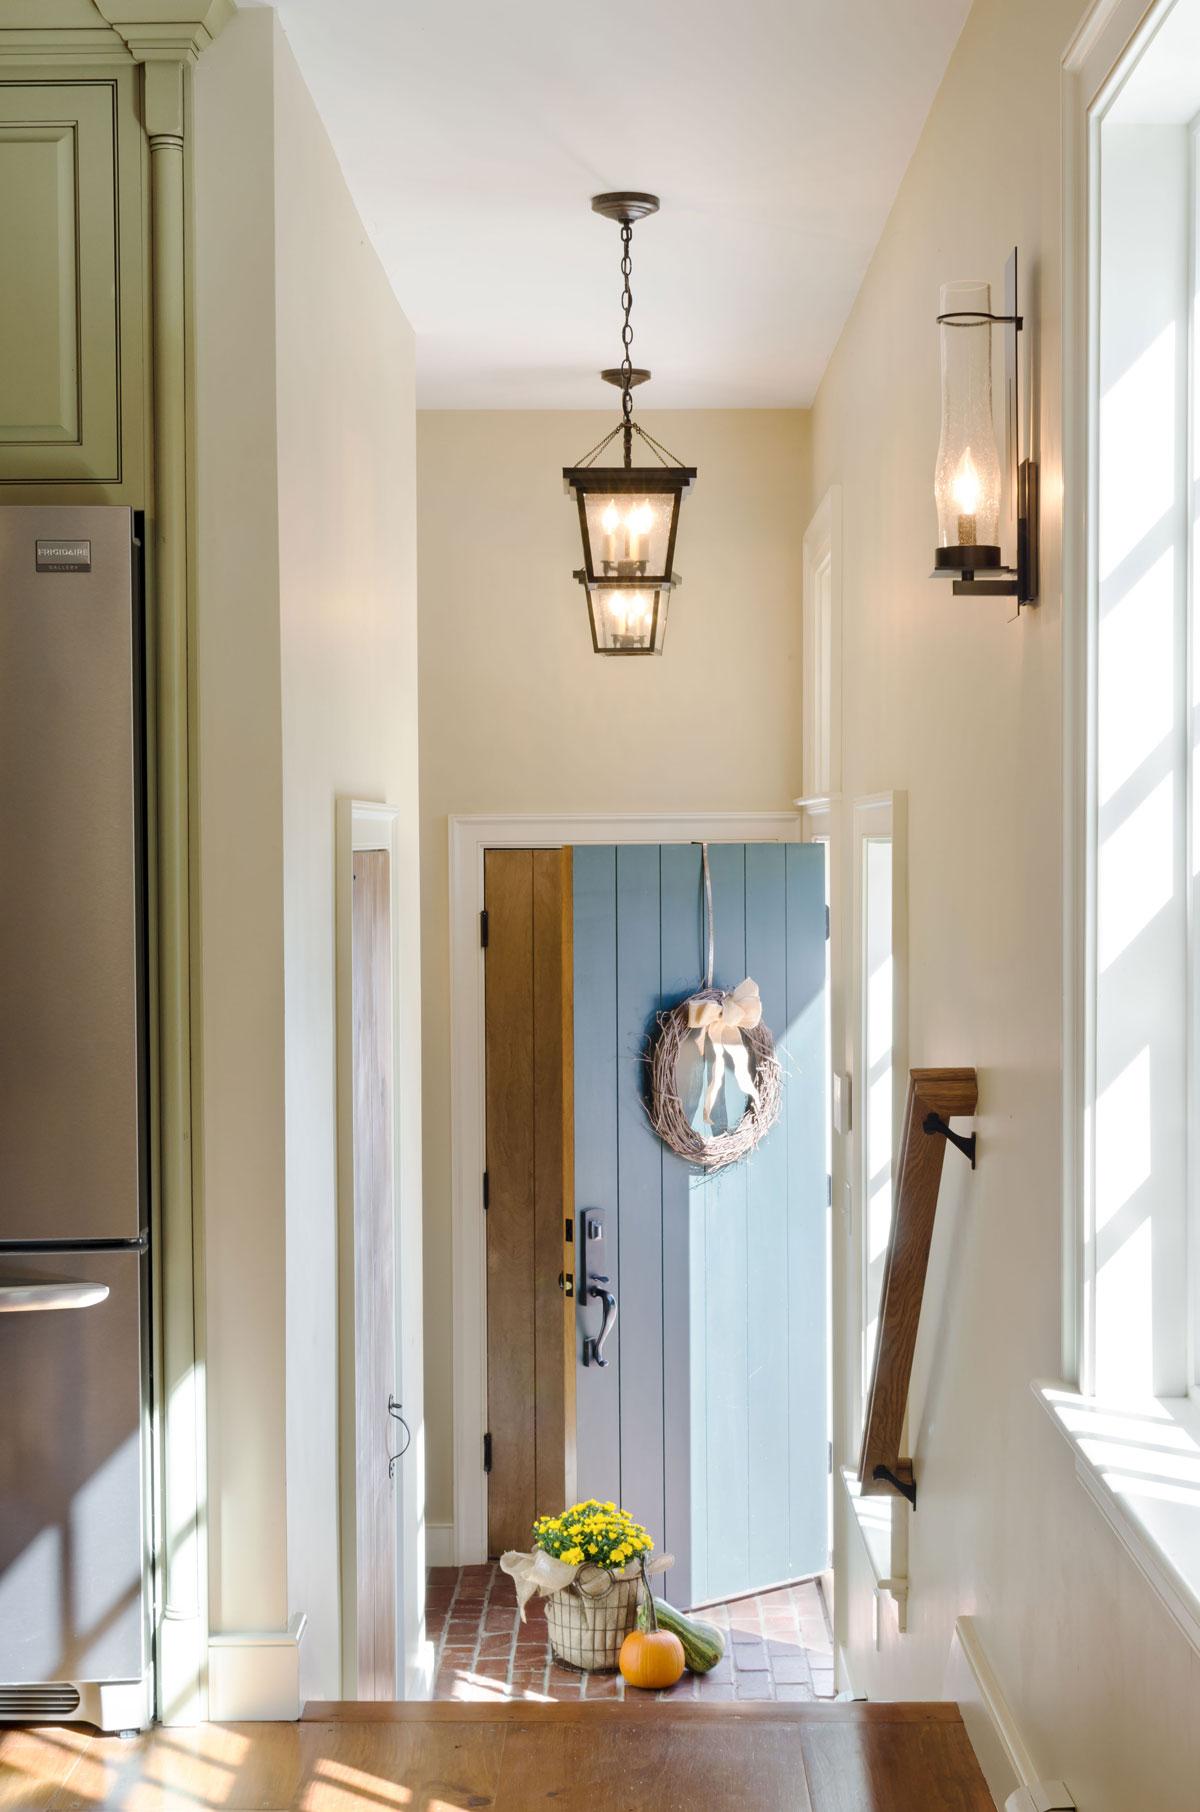 Duxbury, MA interior design by Susan Curtis Interiors